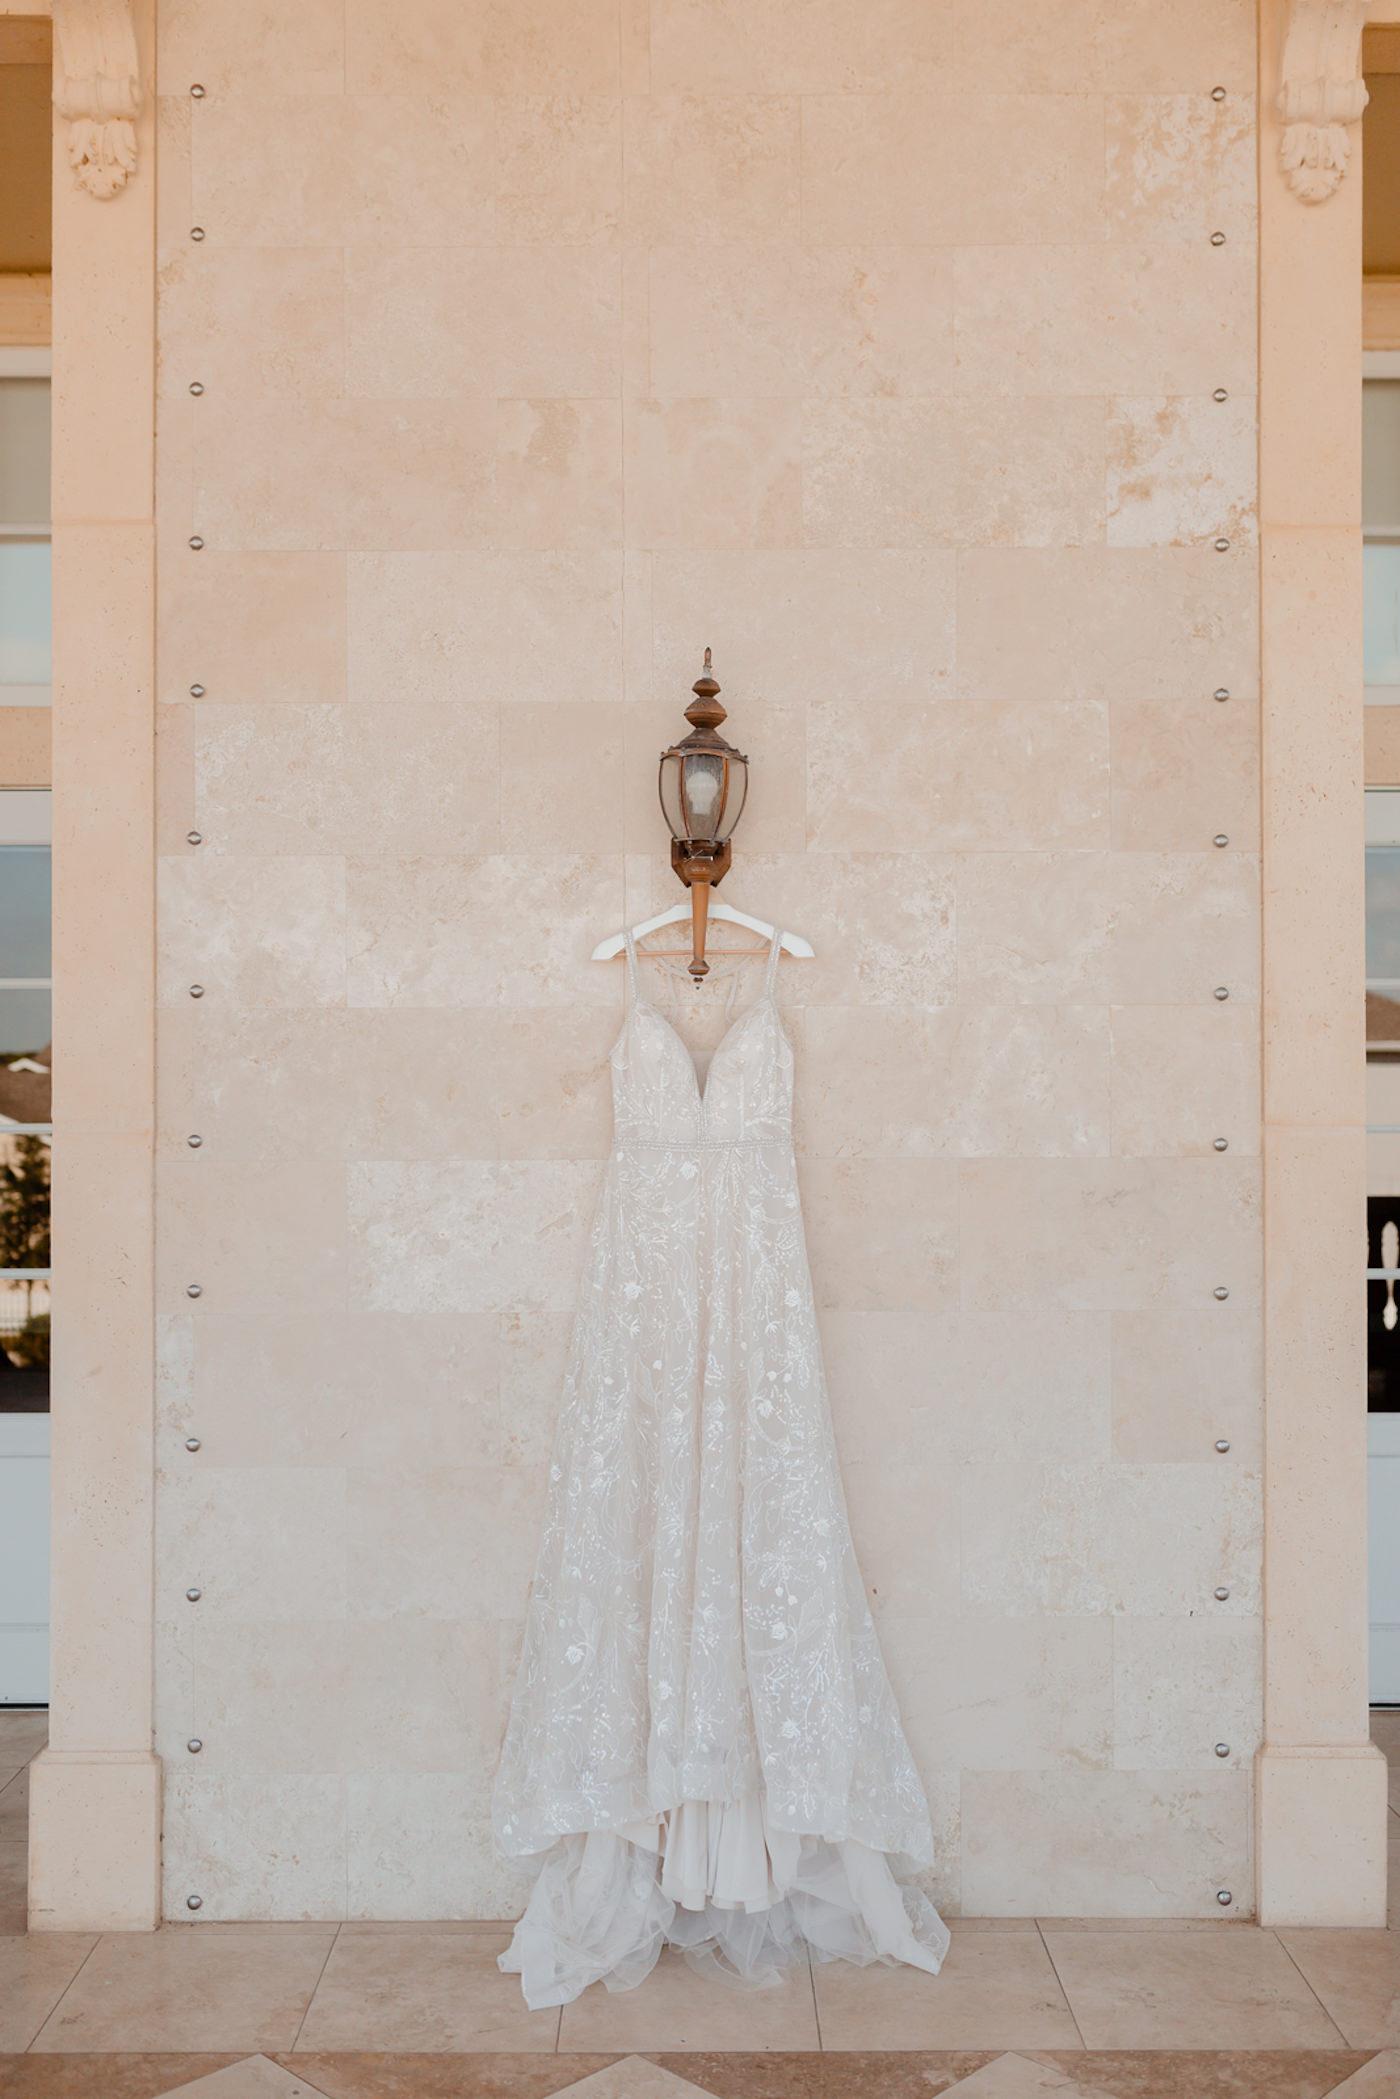 Boho Glam Wedding Dress | Wedding Dress Hanger Shot with Embroidered Floral Lace V Neck Bridal Gown